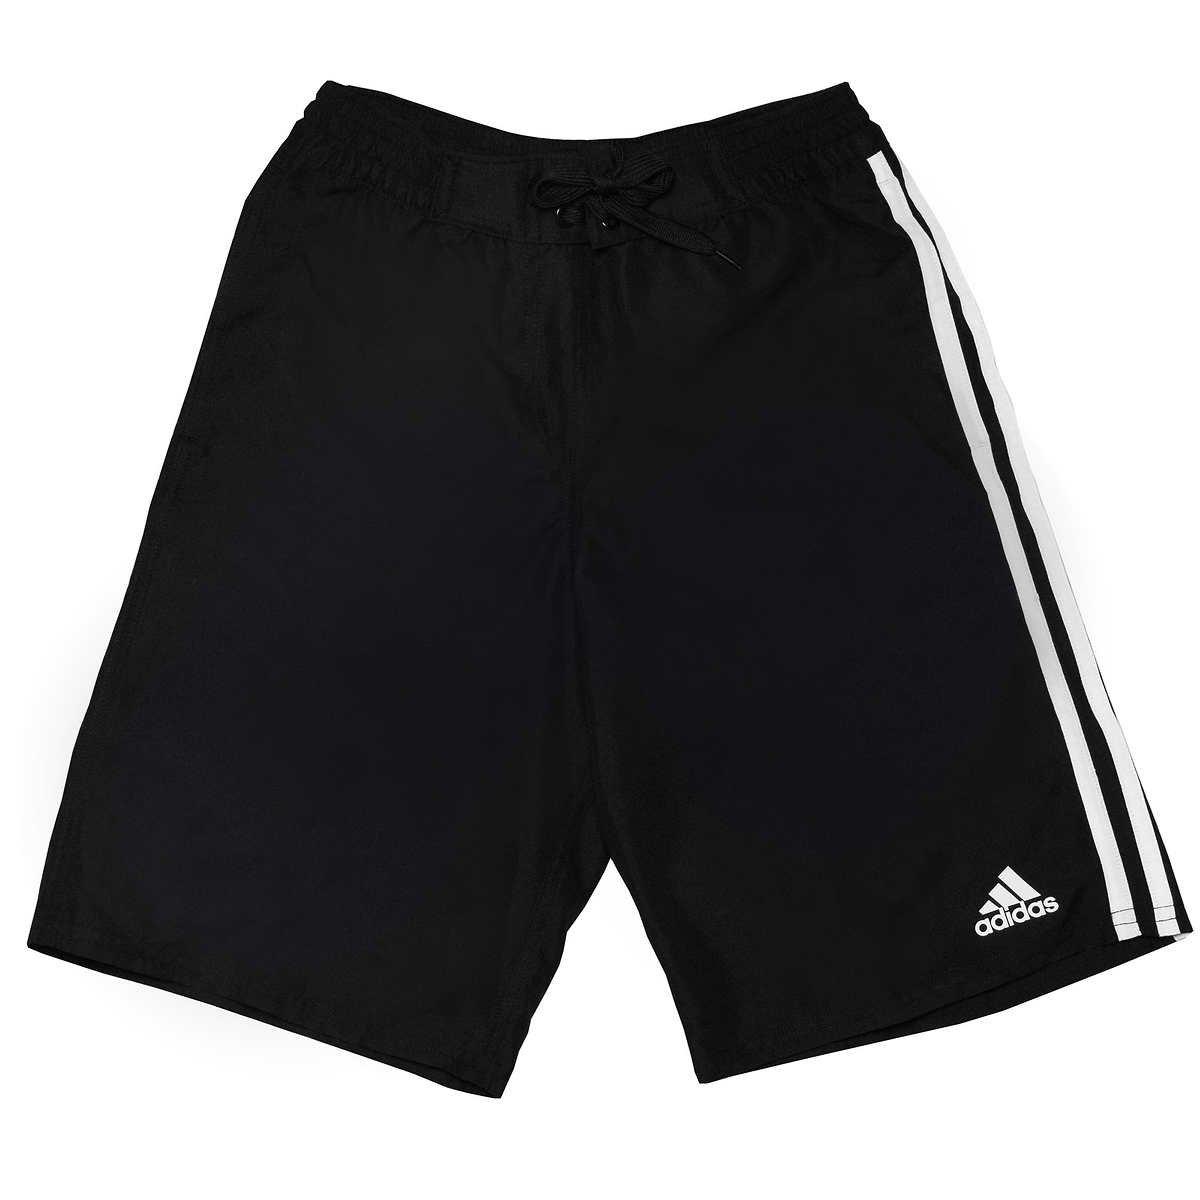 adidas Boys Boardshorts Black Small